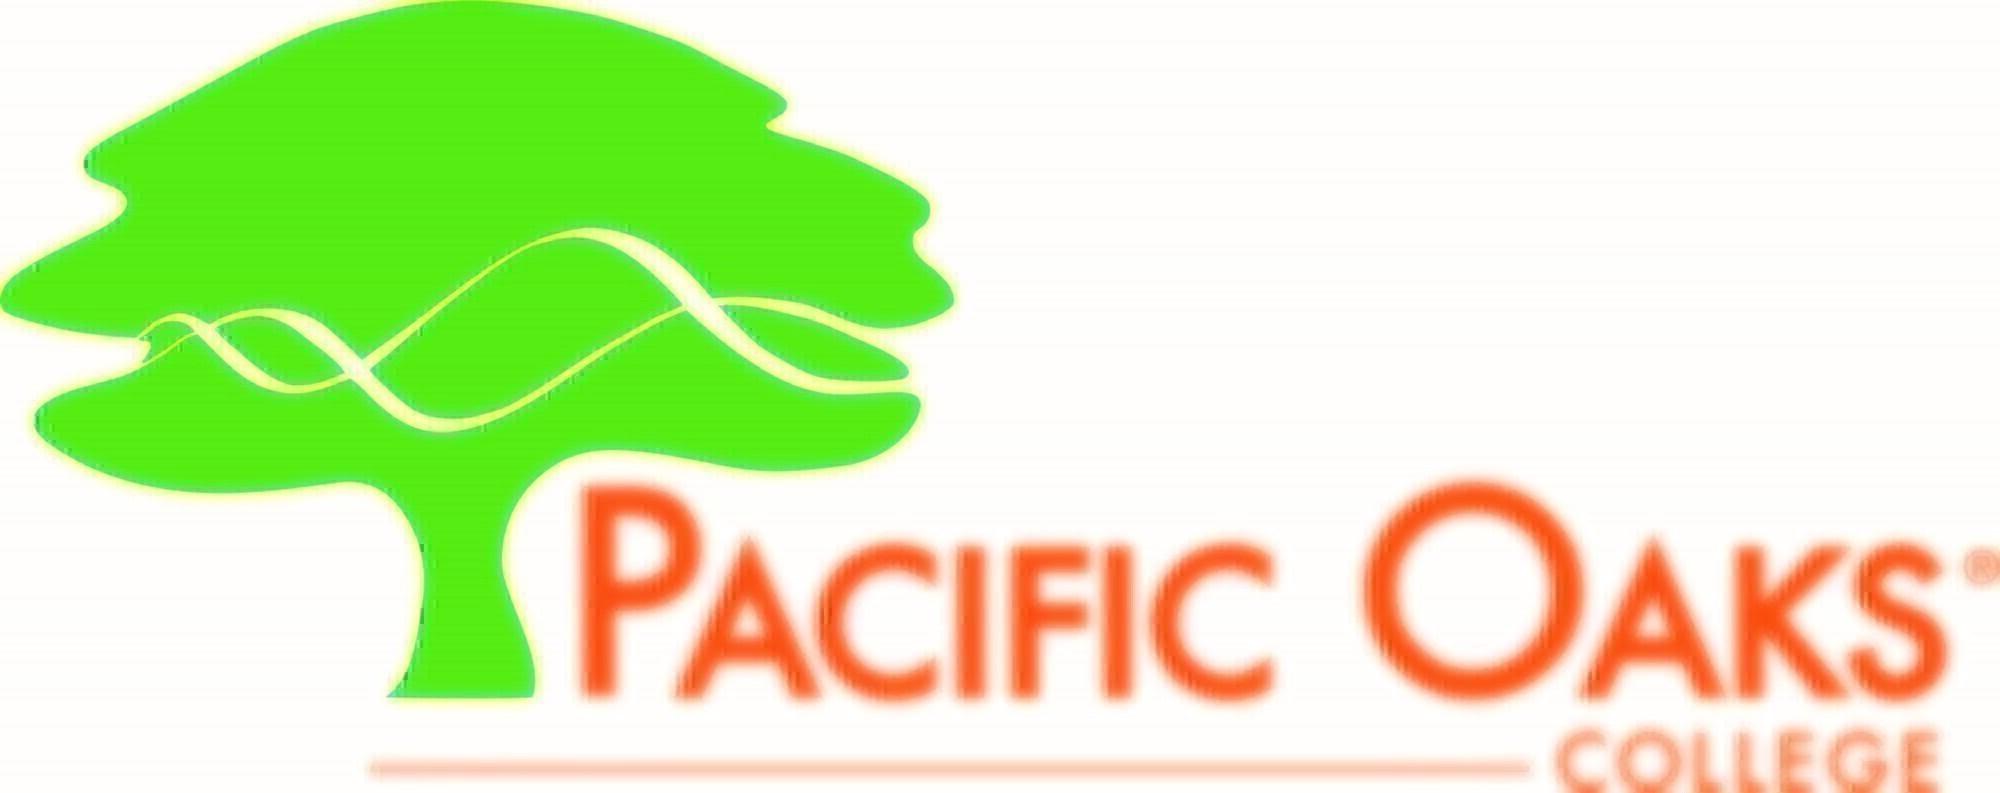 Pacific Oaks College Schools for Veterans